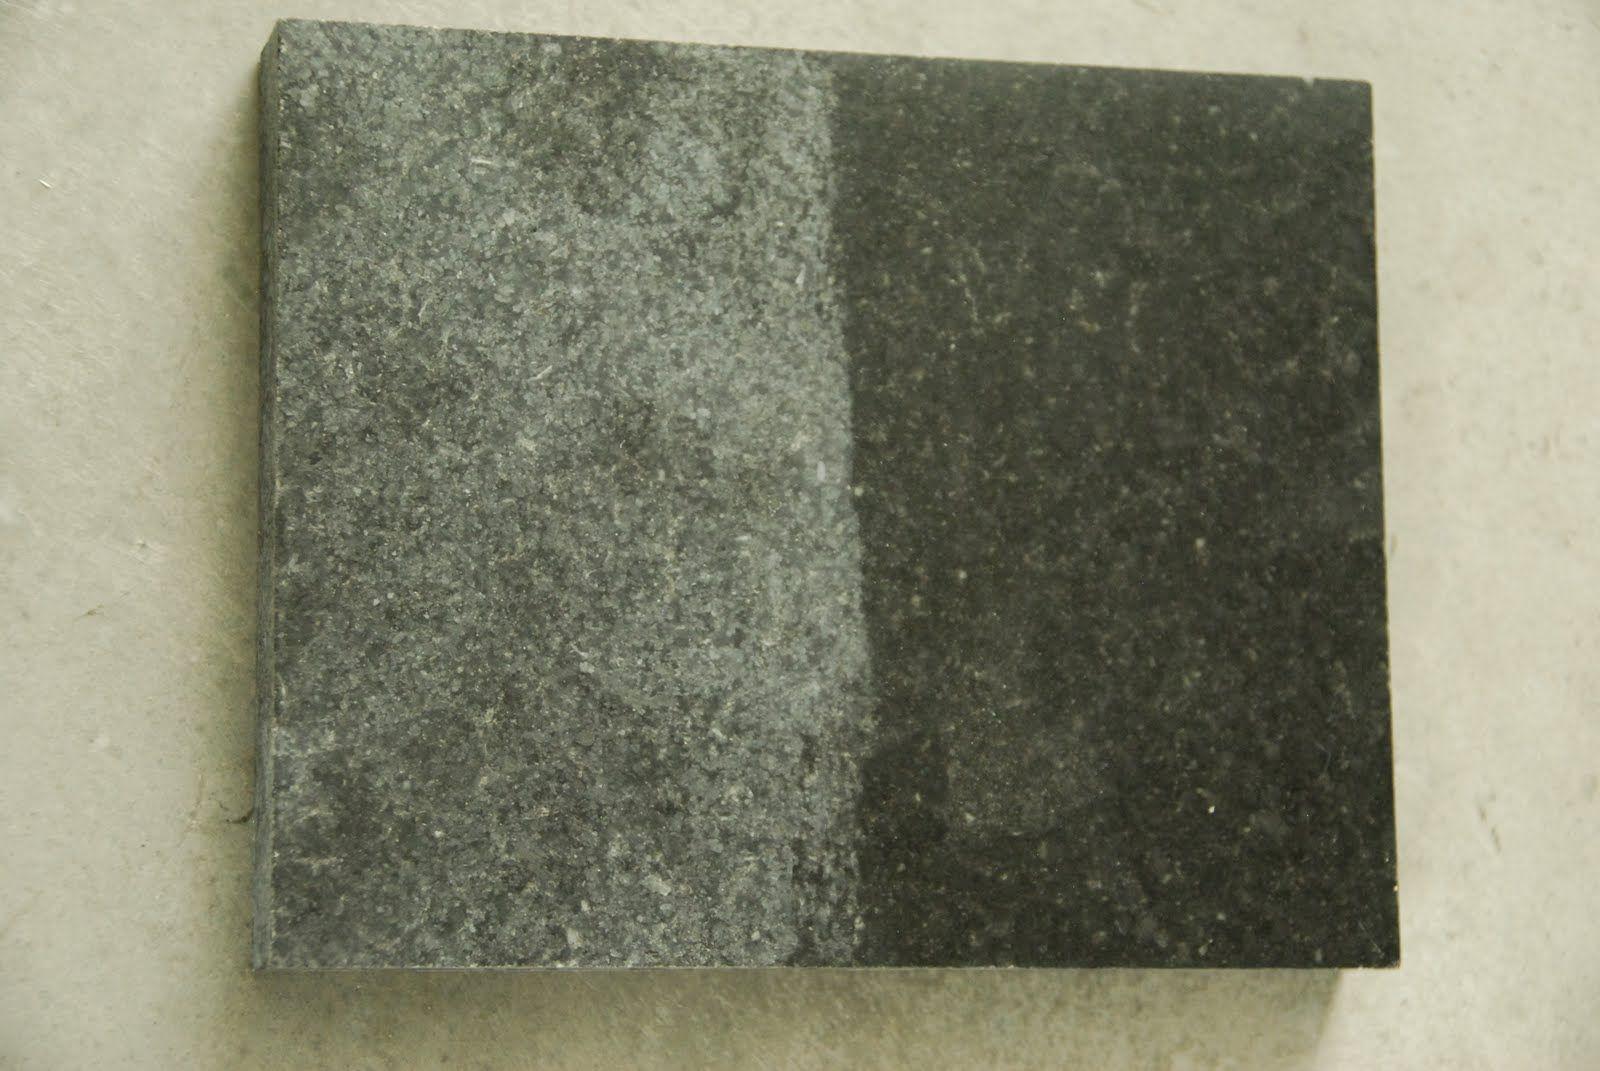 The Granite Gurus FAQ Friday How to Prevent Fingerprints